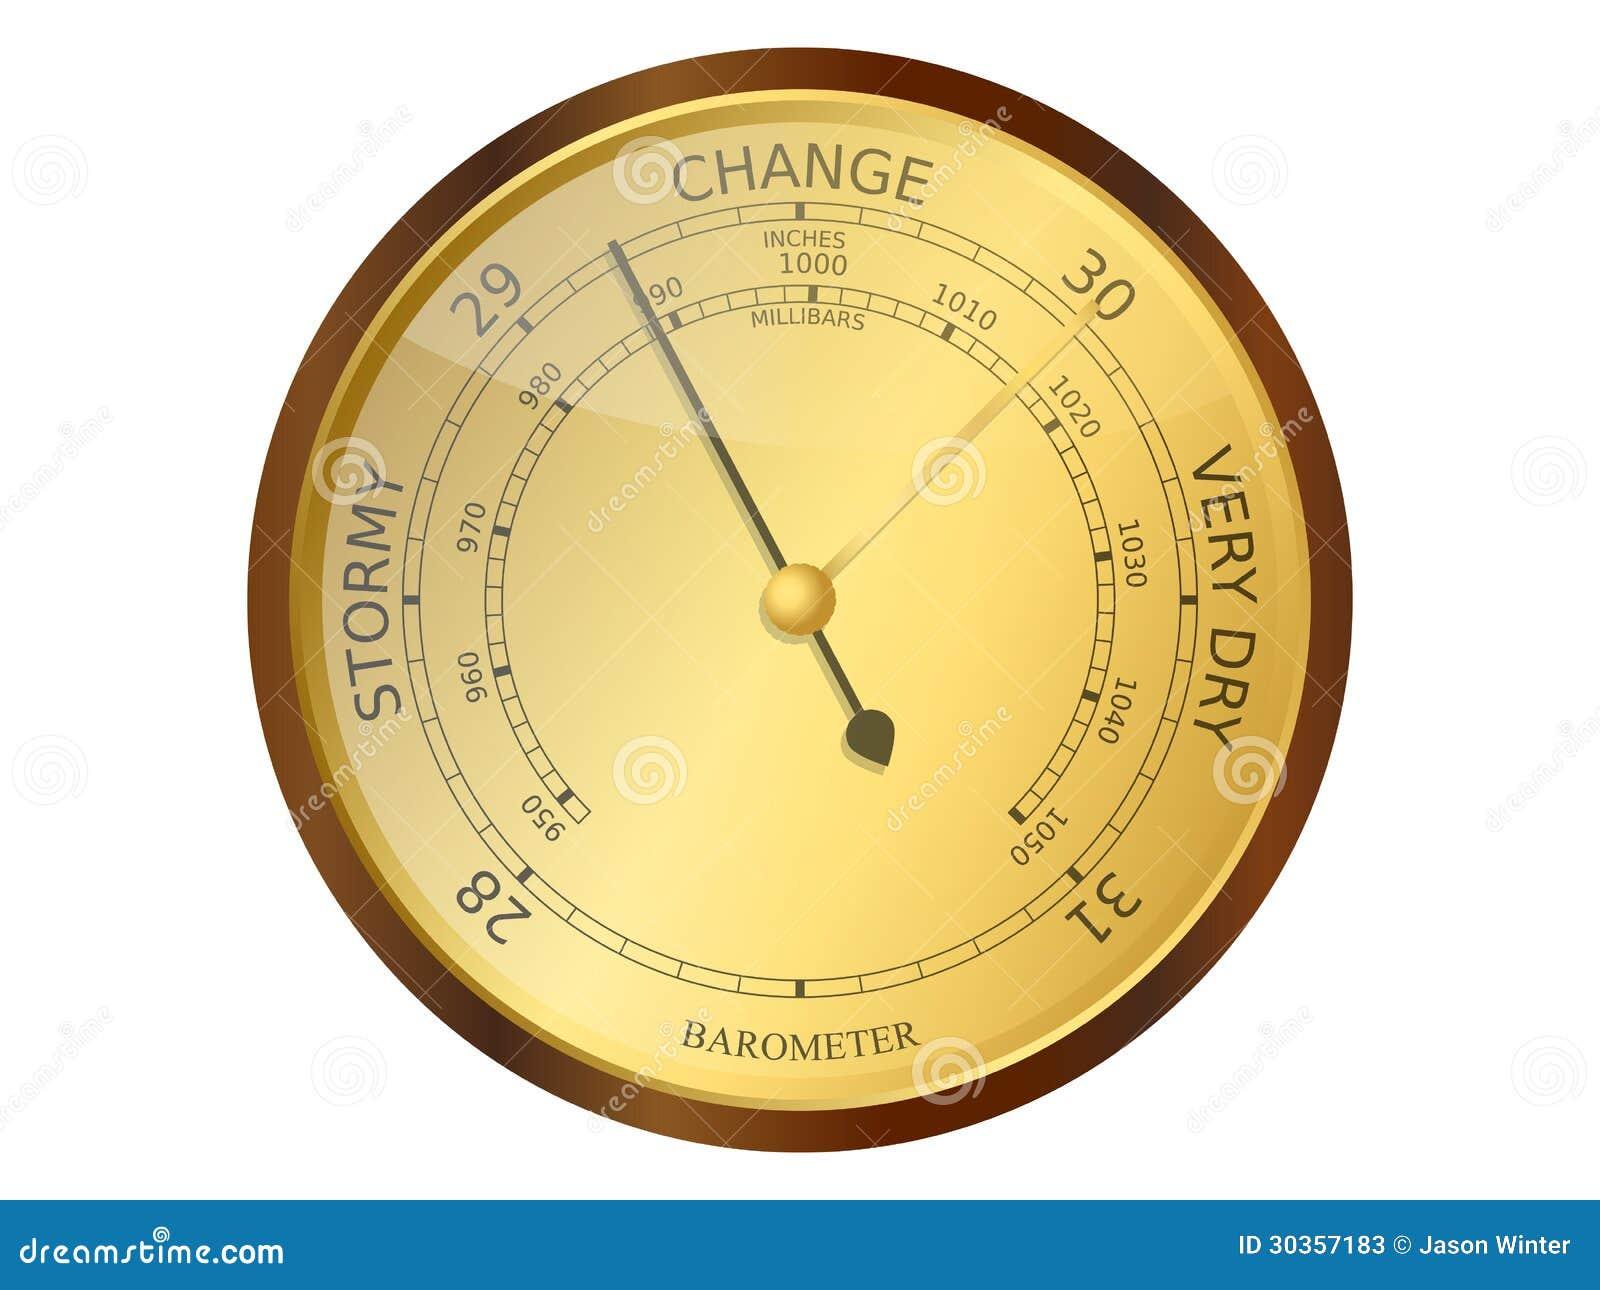 Barometer Stock Illustrations  Barometer Stock Illustrations Vectors Clipart Dreamstime